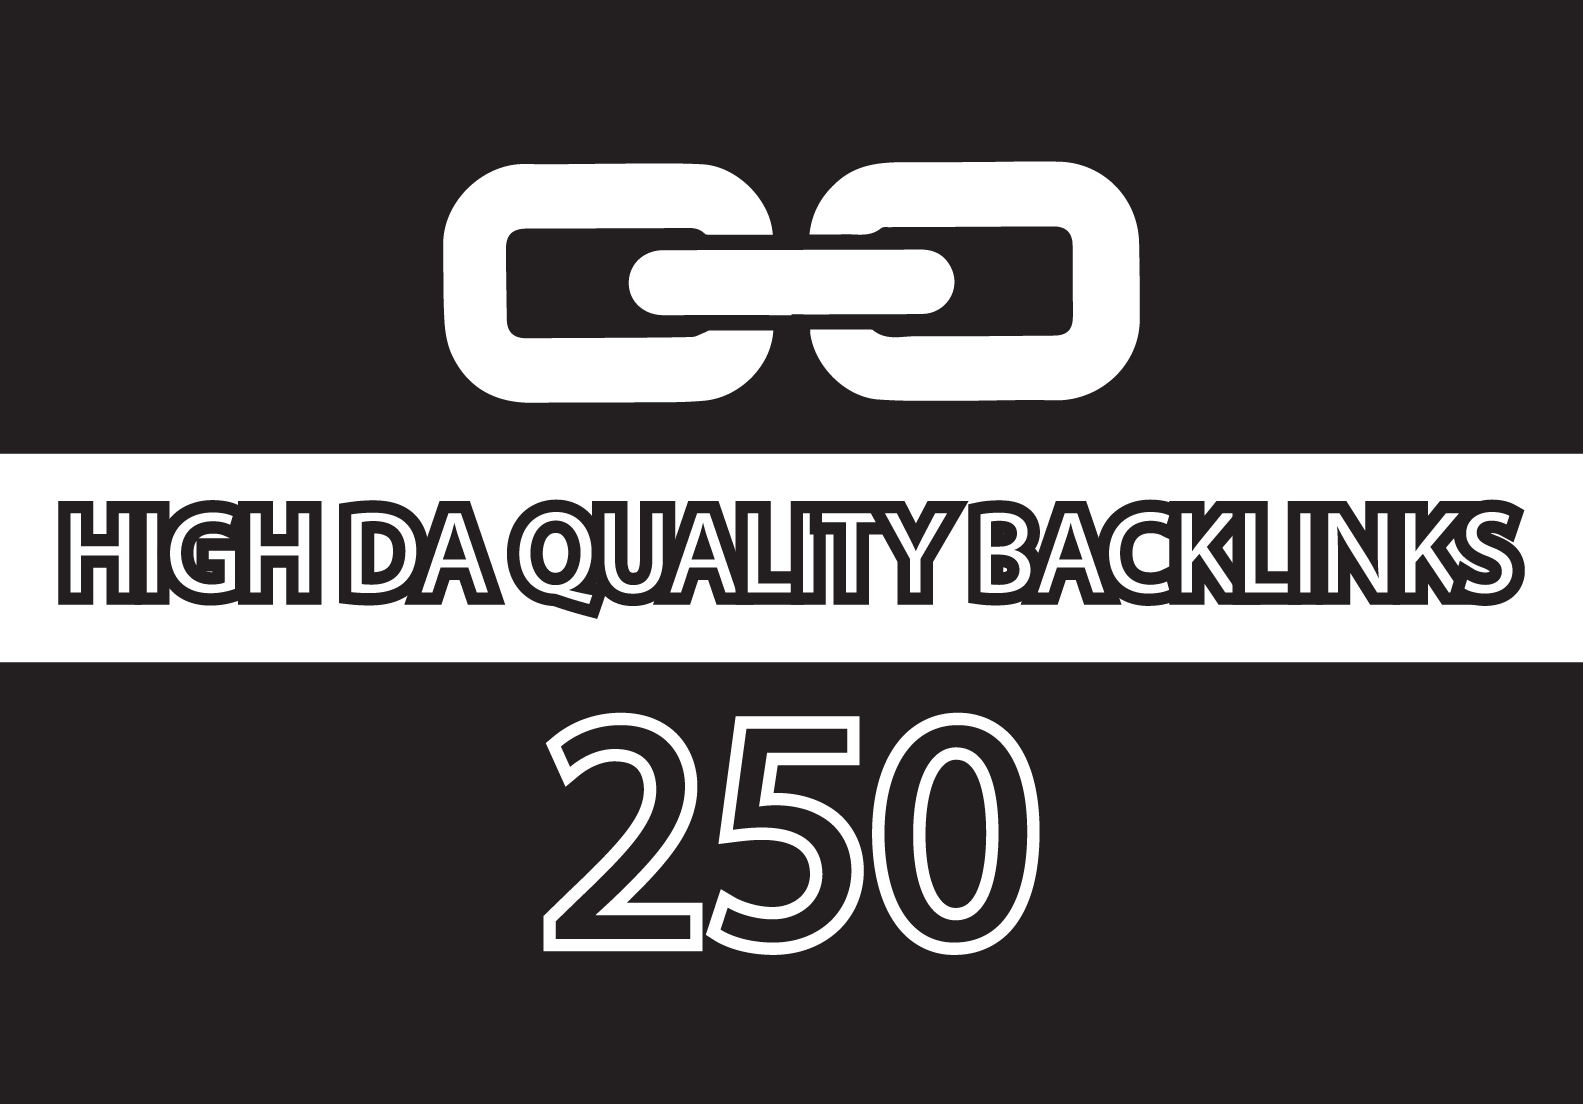 Manually Do 250 High DA profile backlinks for any country